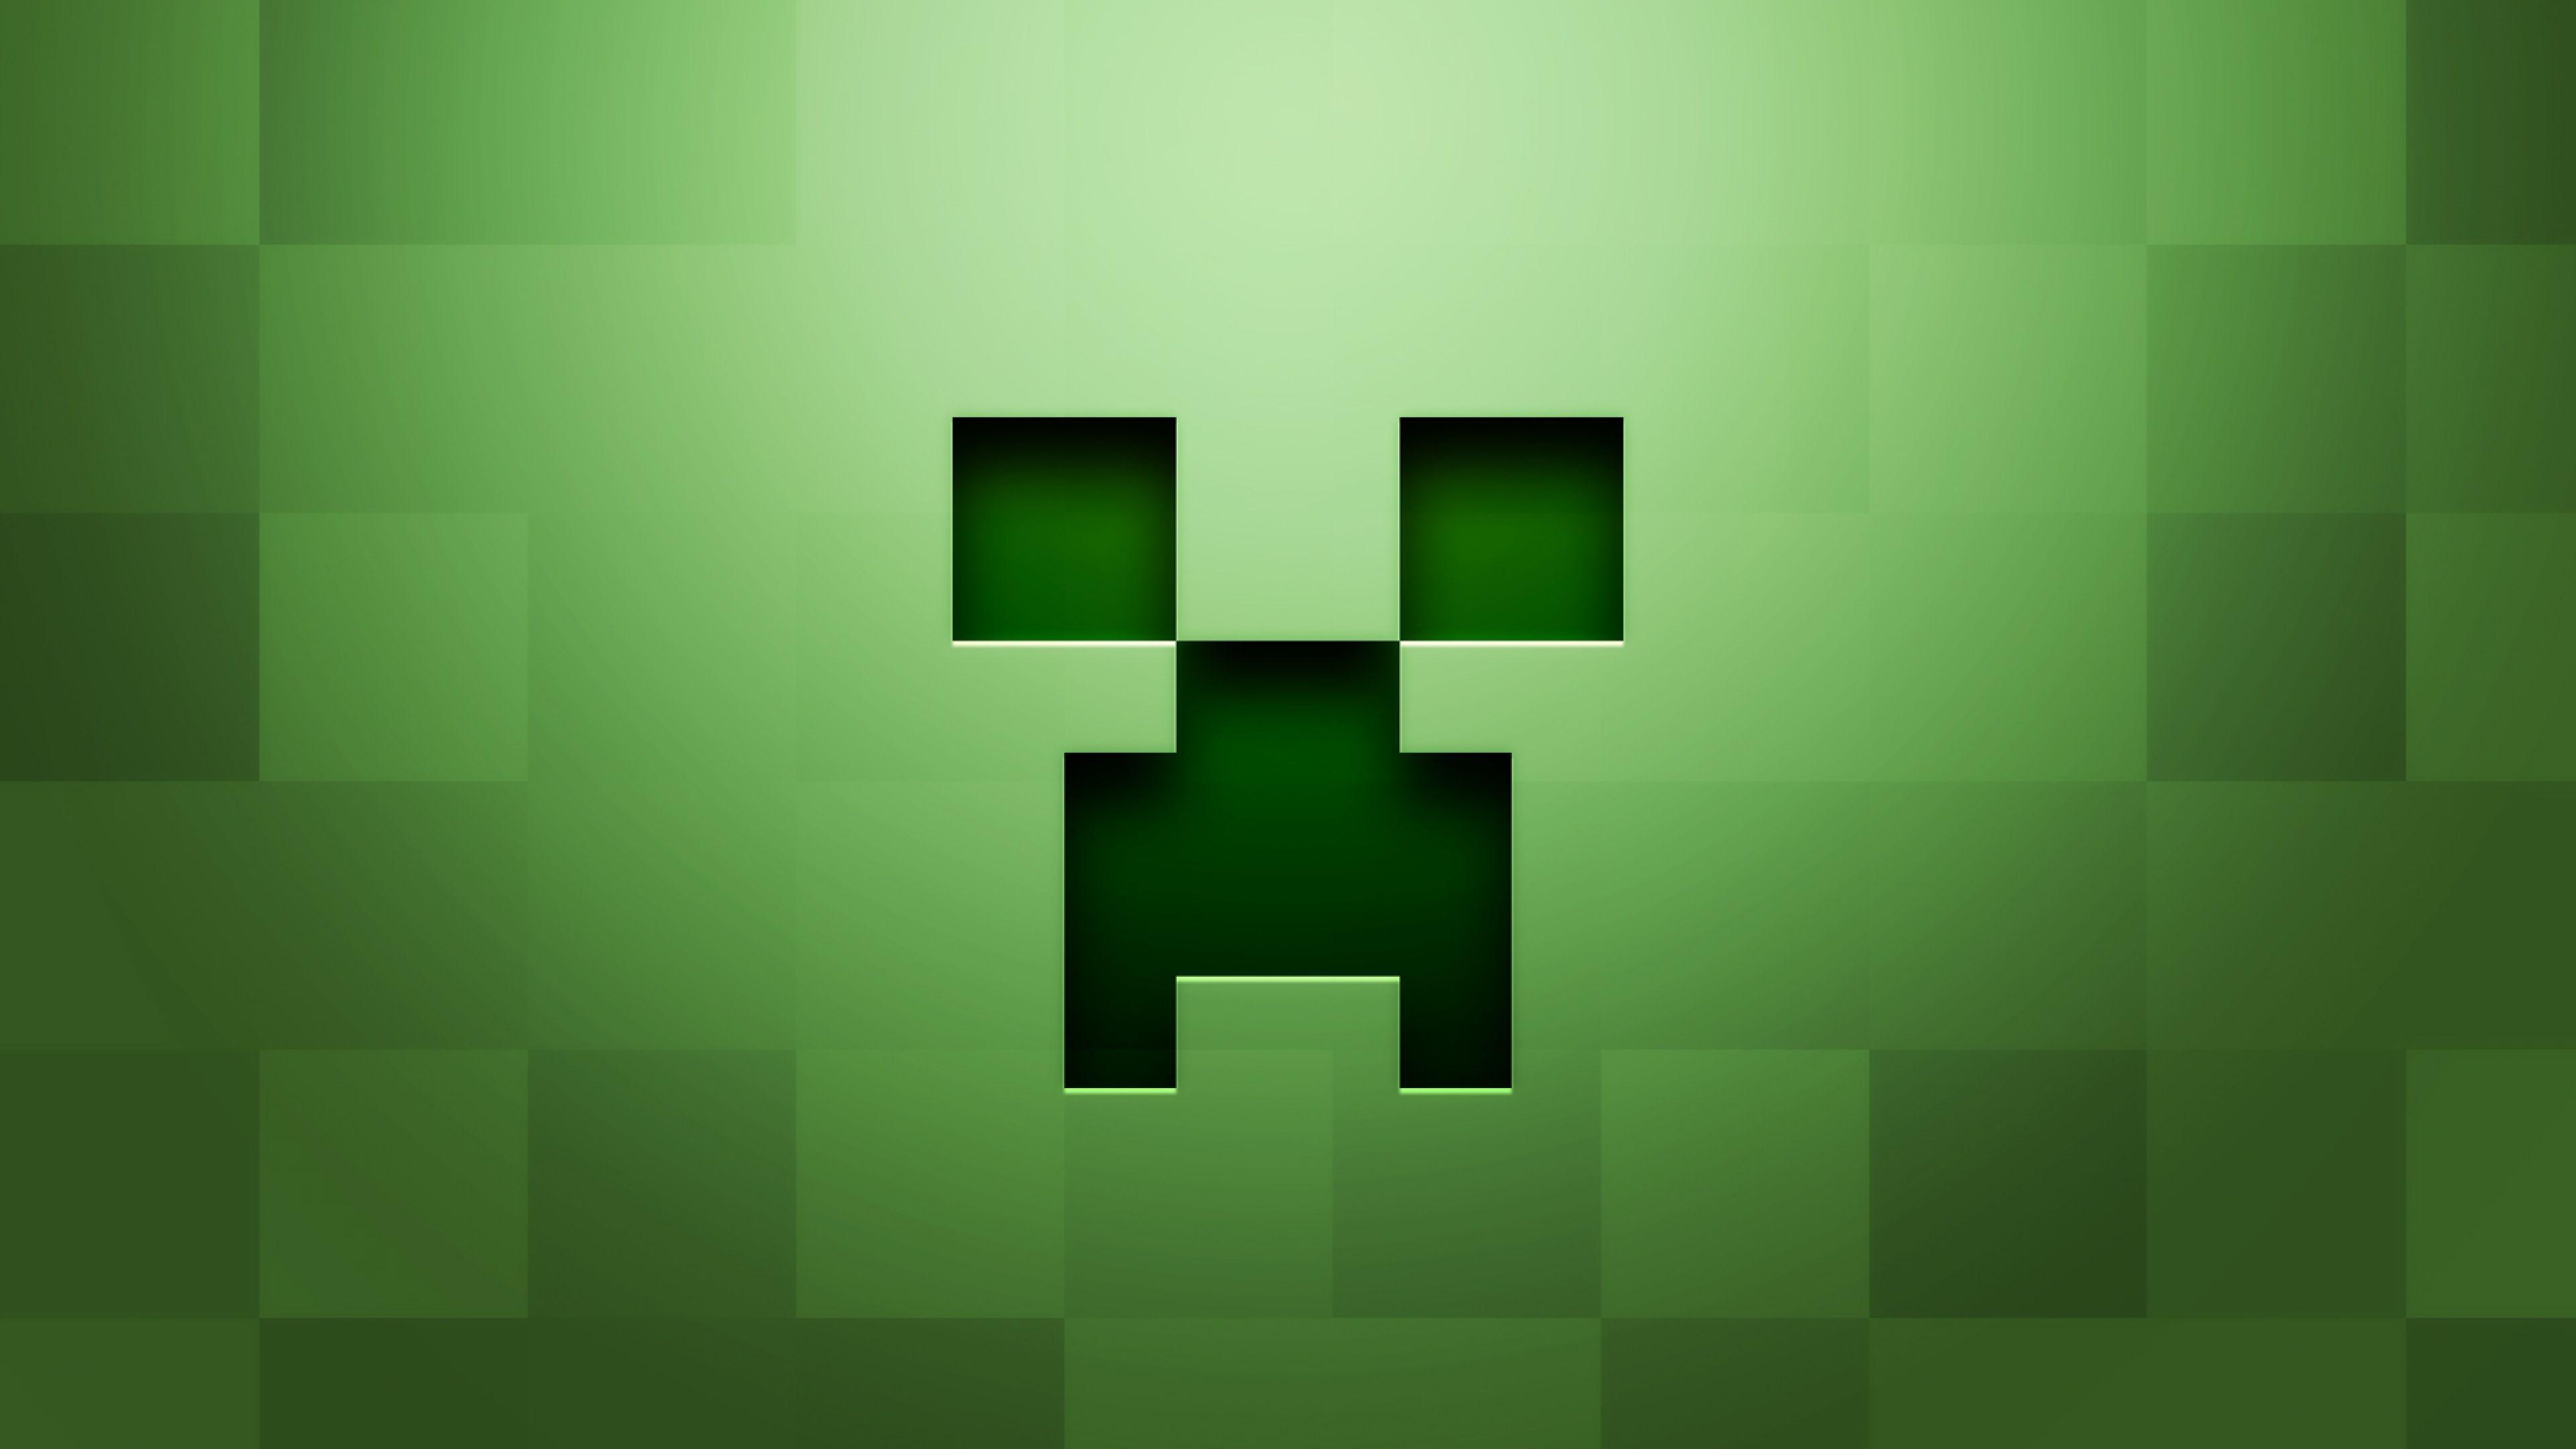 3840x2160 Wallpaper Minecraft Background Graphics Green Jeux